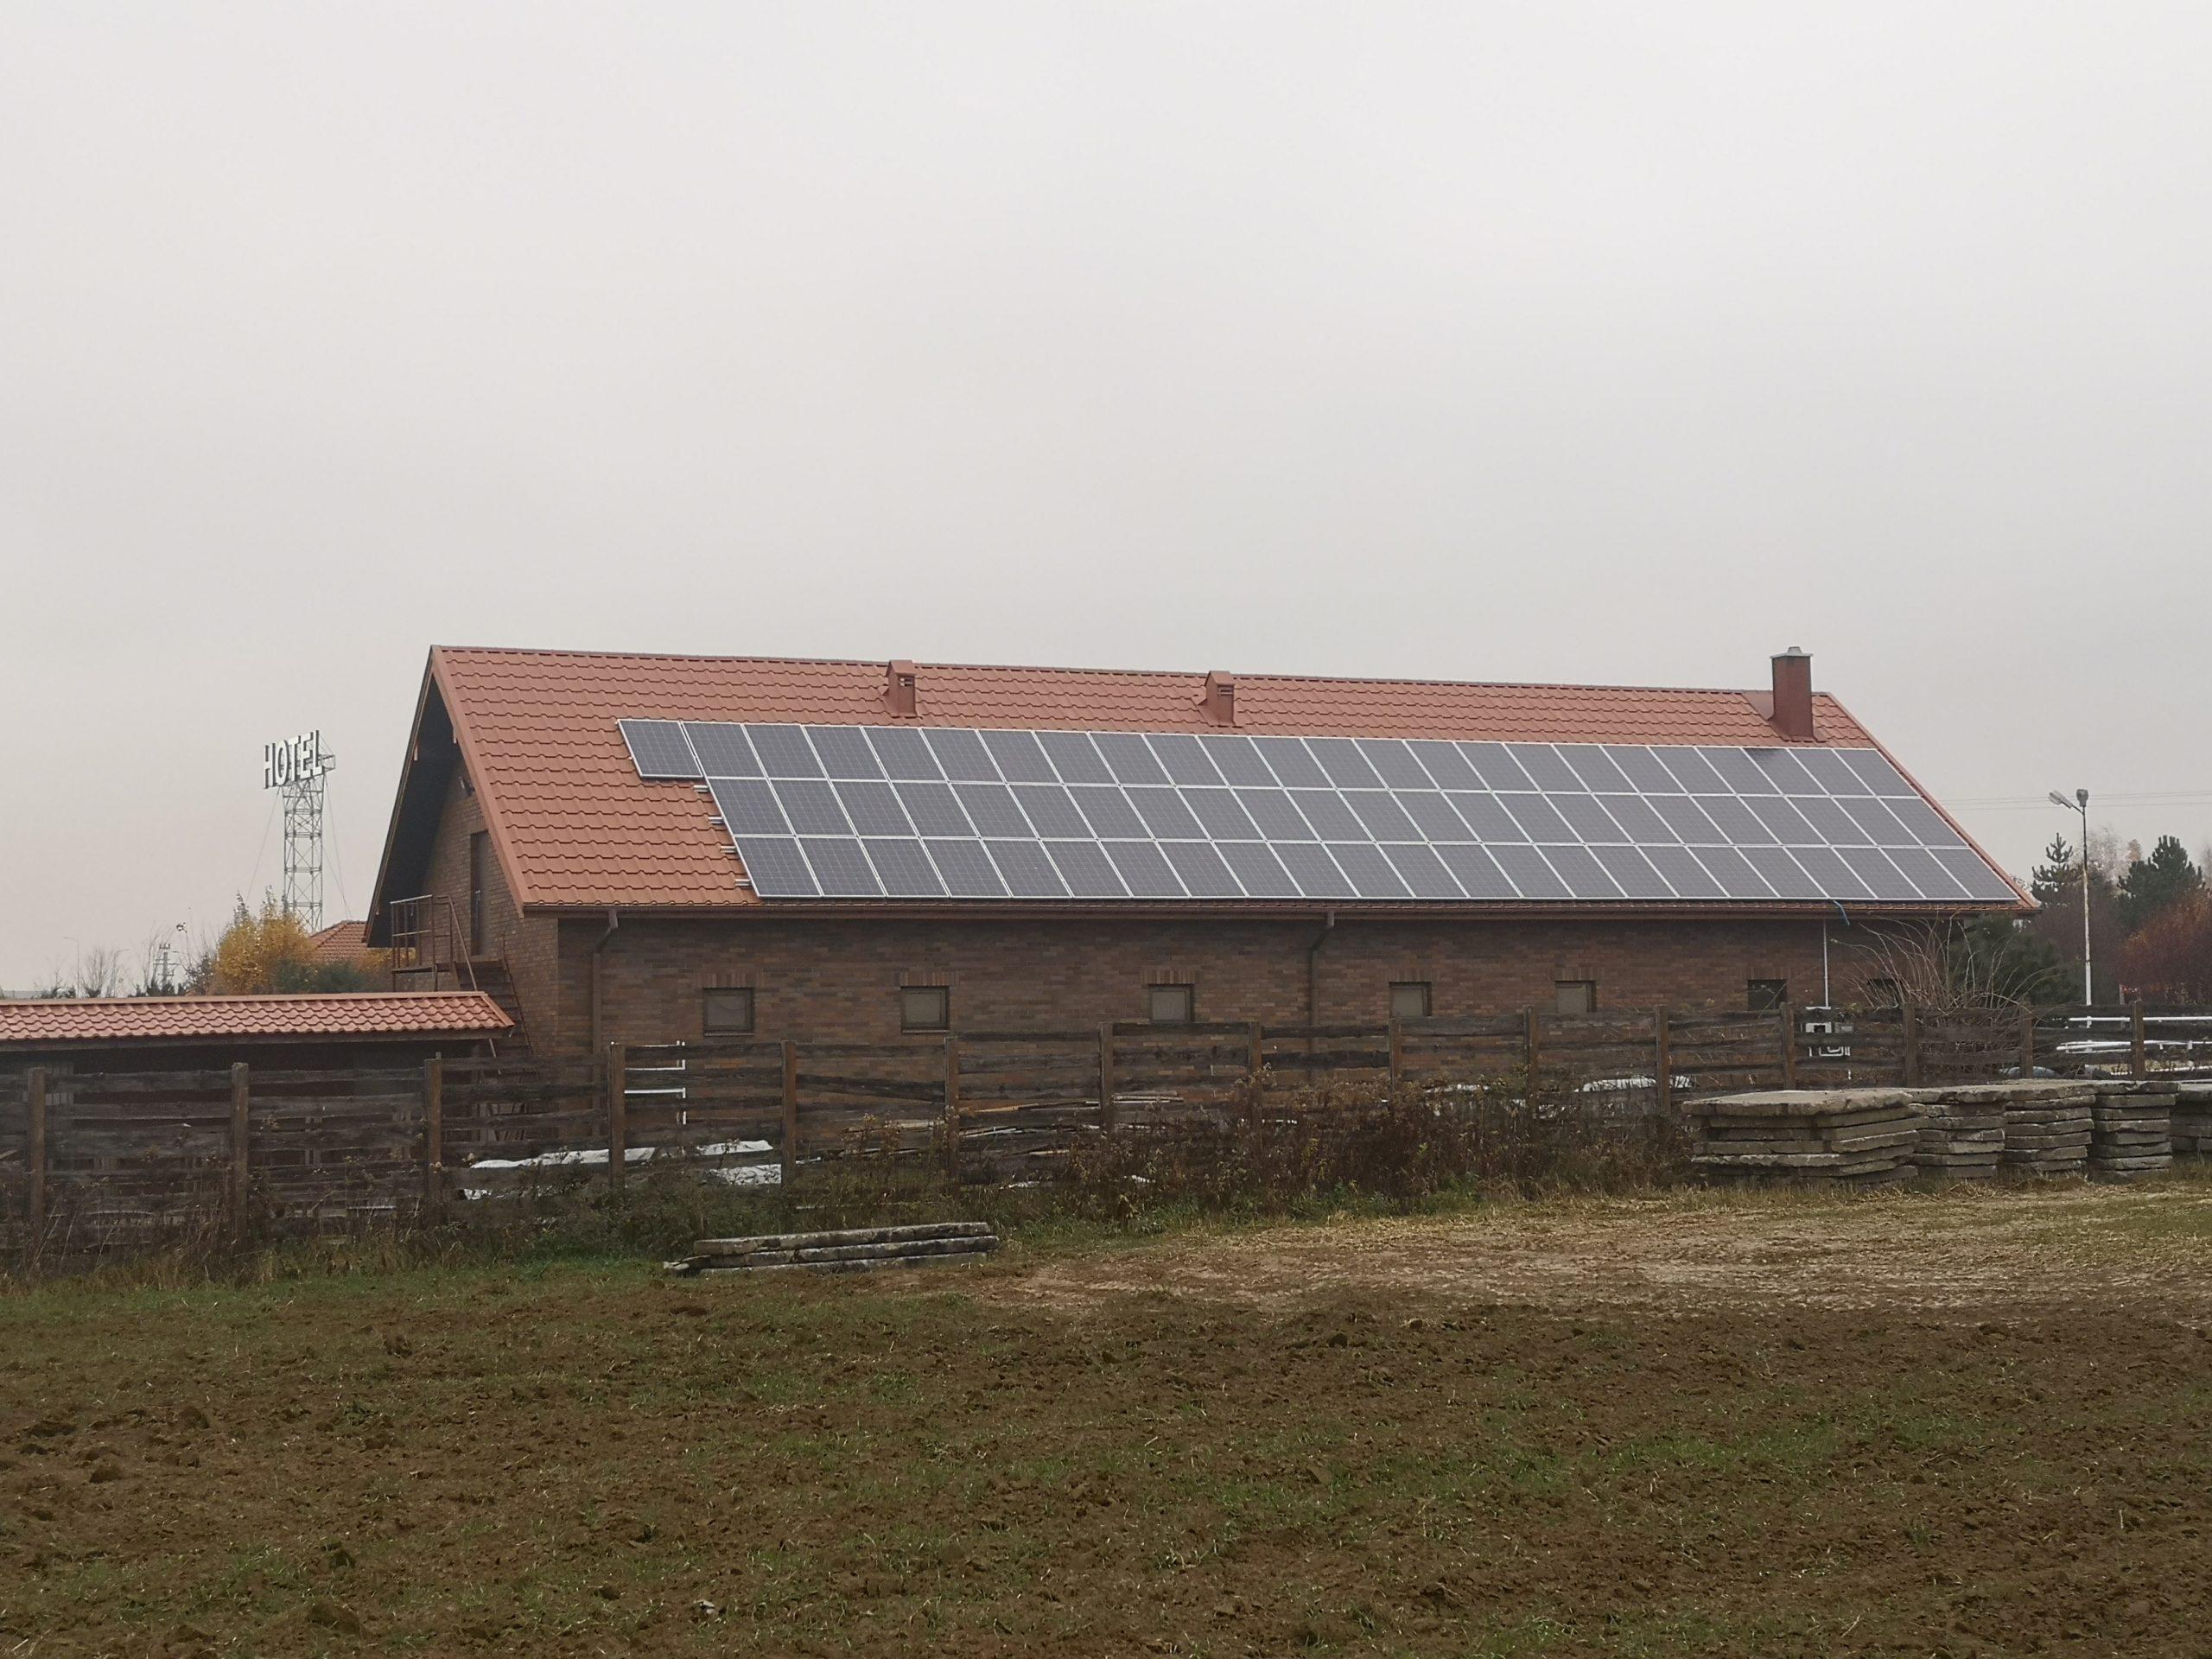 Hotel Biesiada - Bogucin (gmina Garbów) - 19,6 kWp